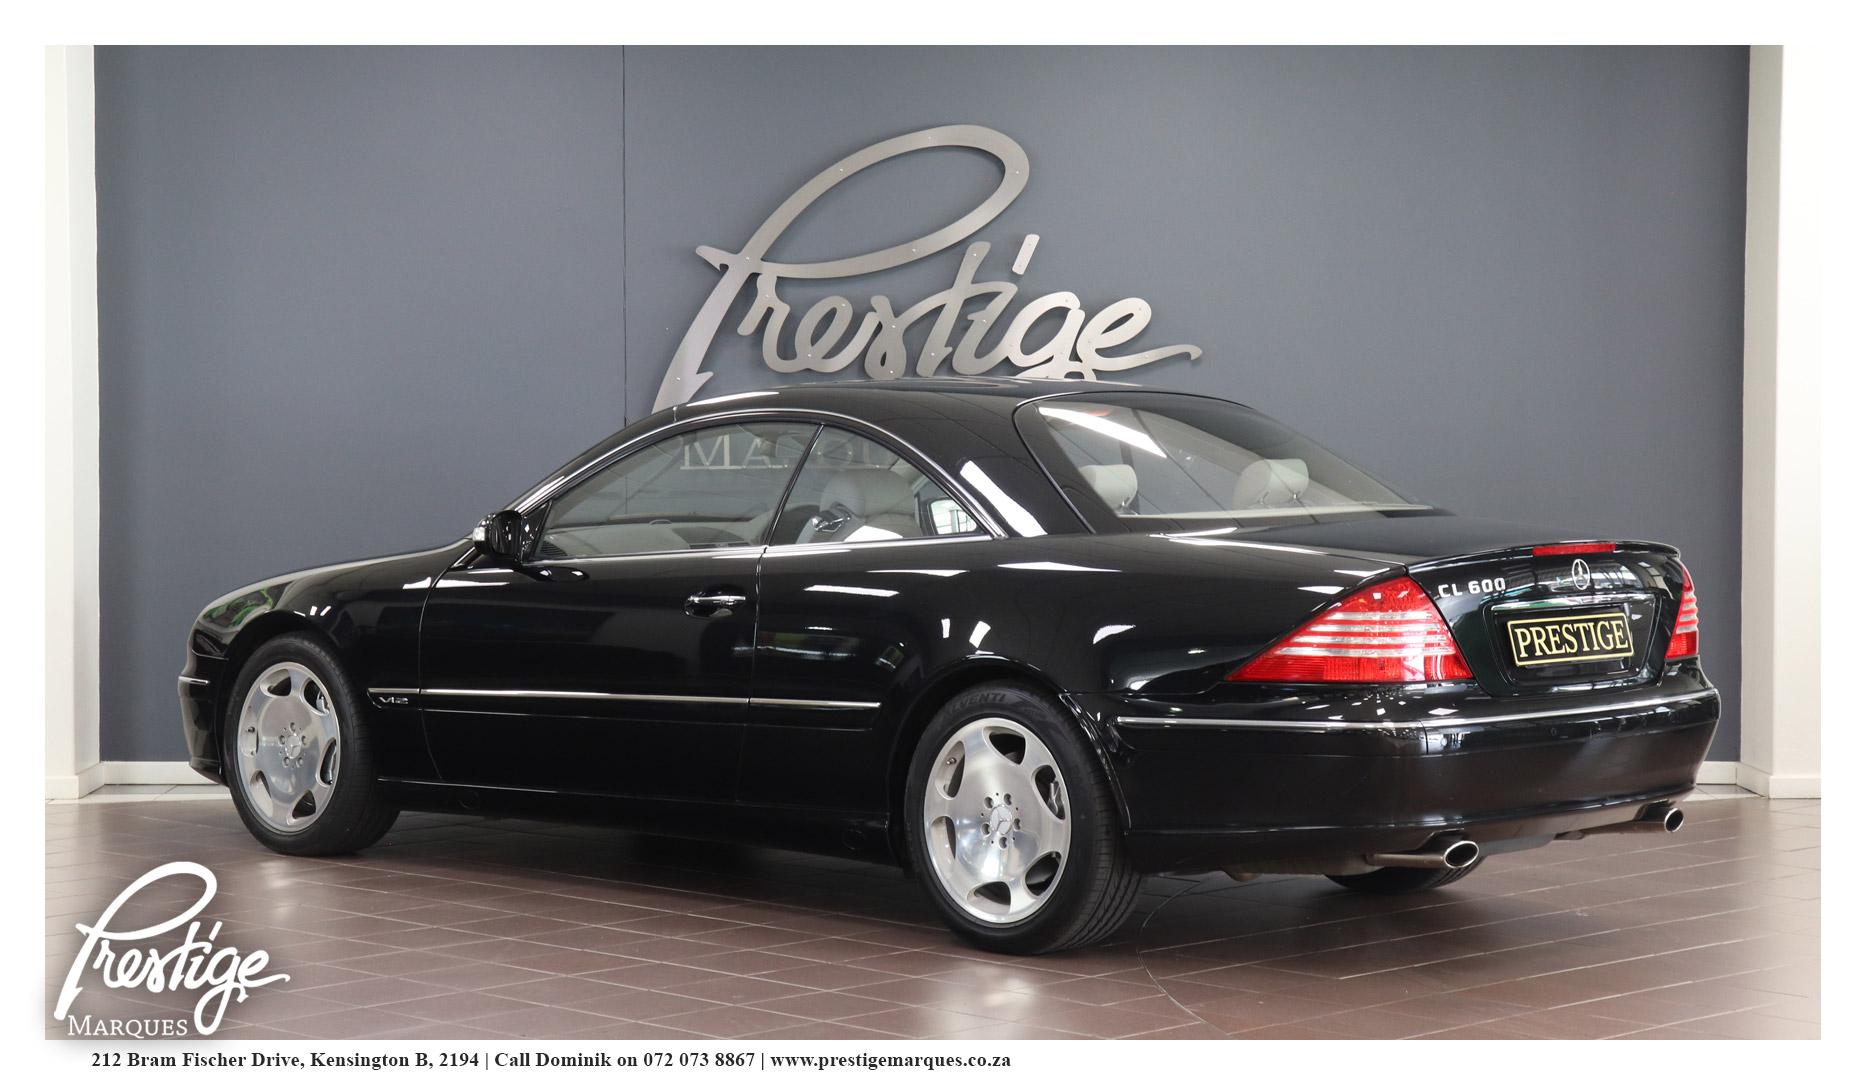 2005-Mercedes-Benz-CL-600-Coupe-Prestige-Marques-Randburg-Sandton-5